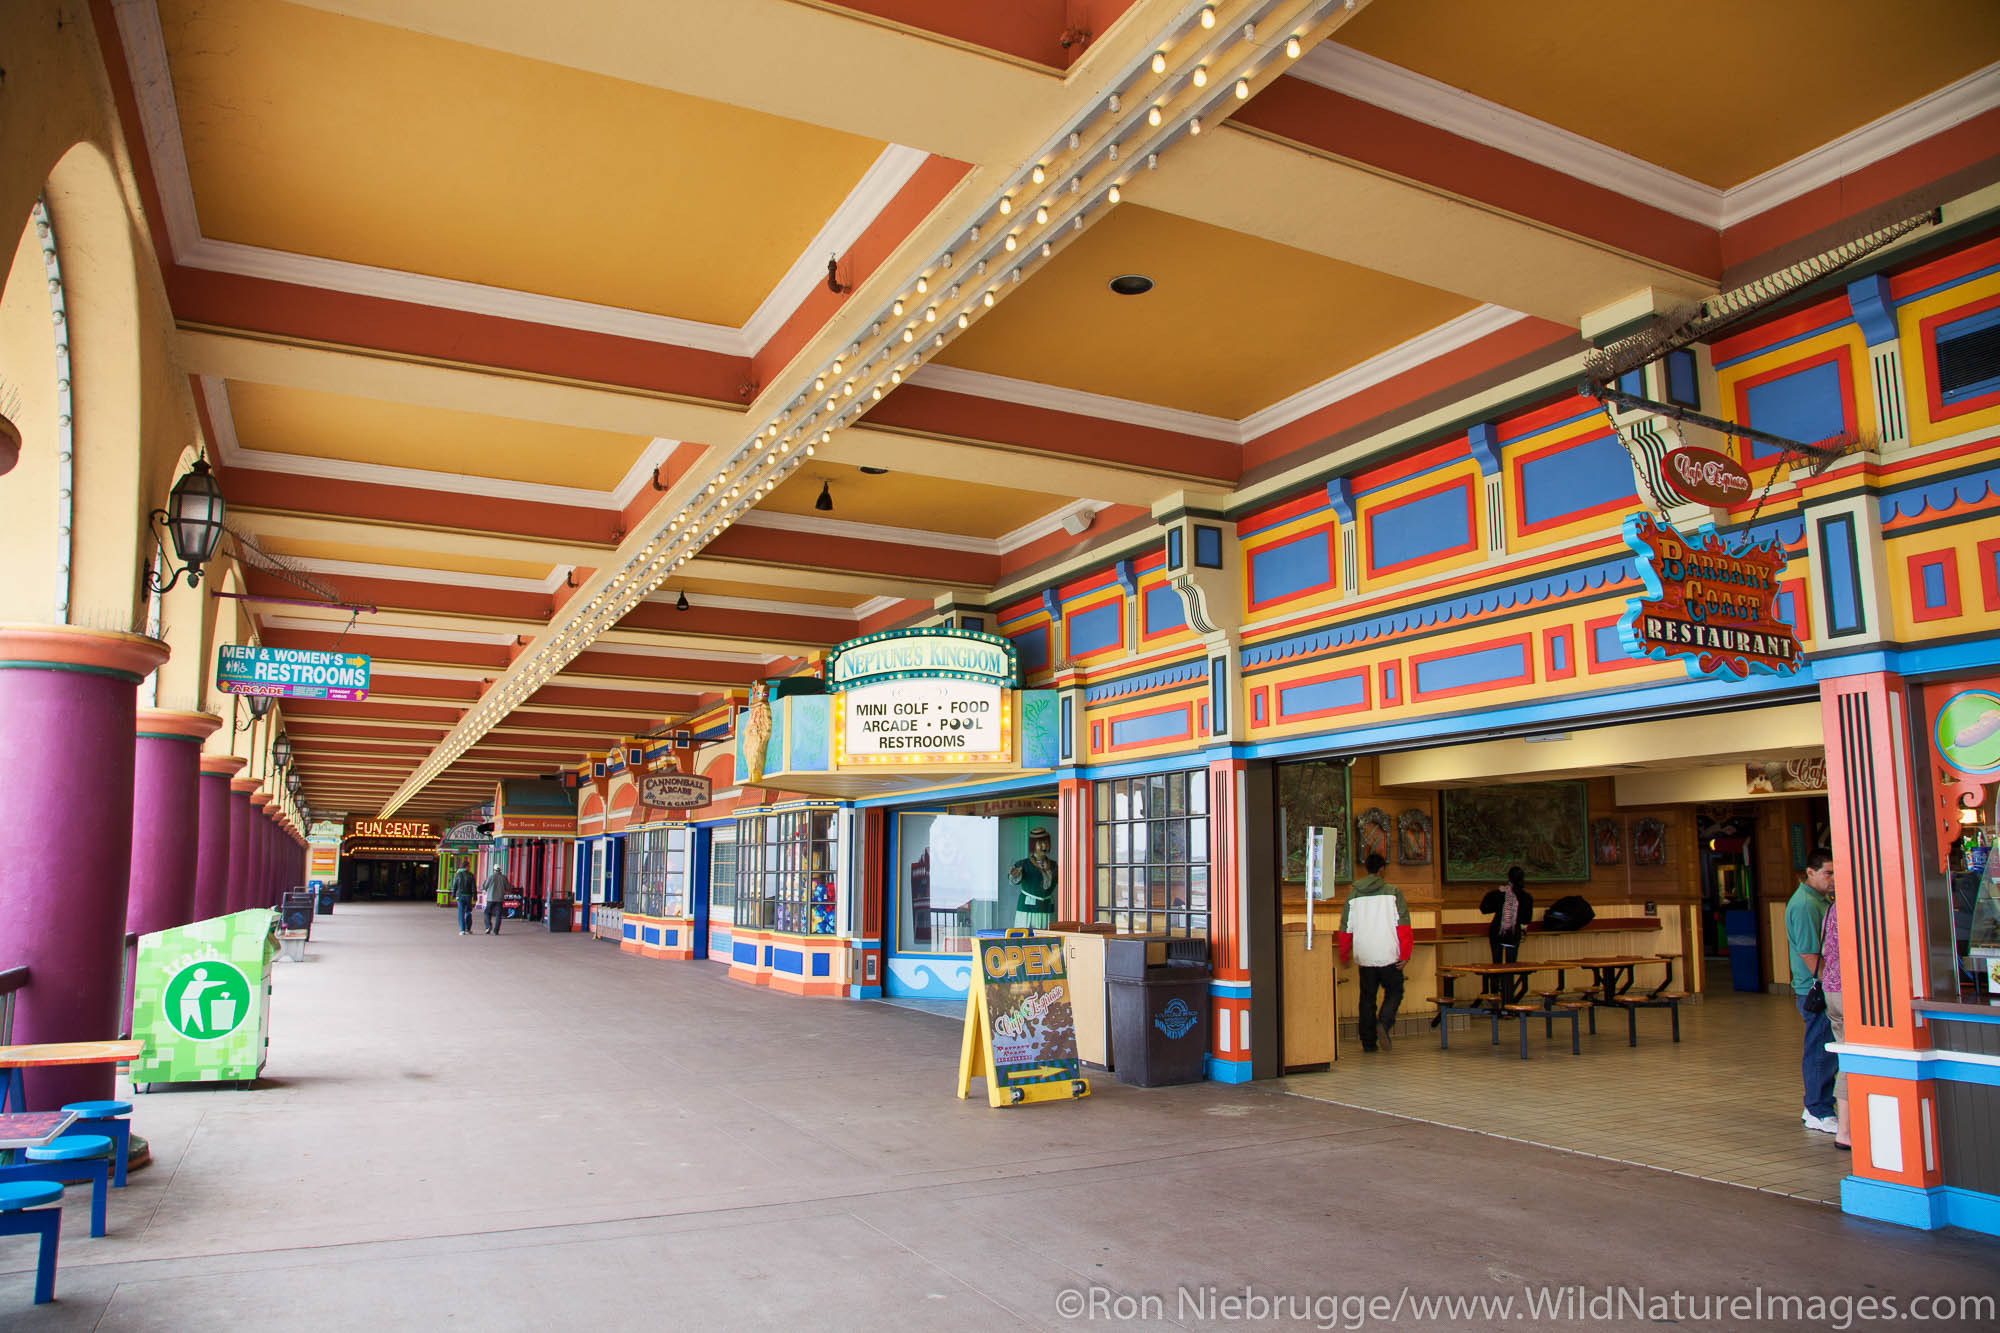 Arcade and Casino at Santa Cruz Beach Boardwalk, California